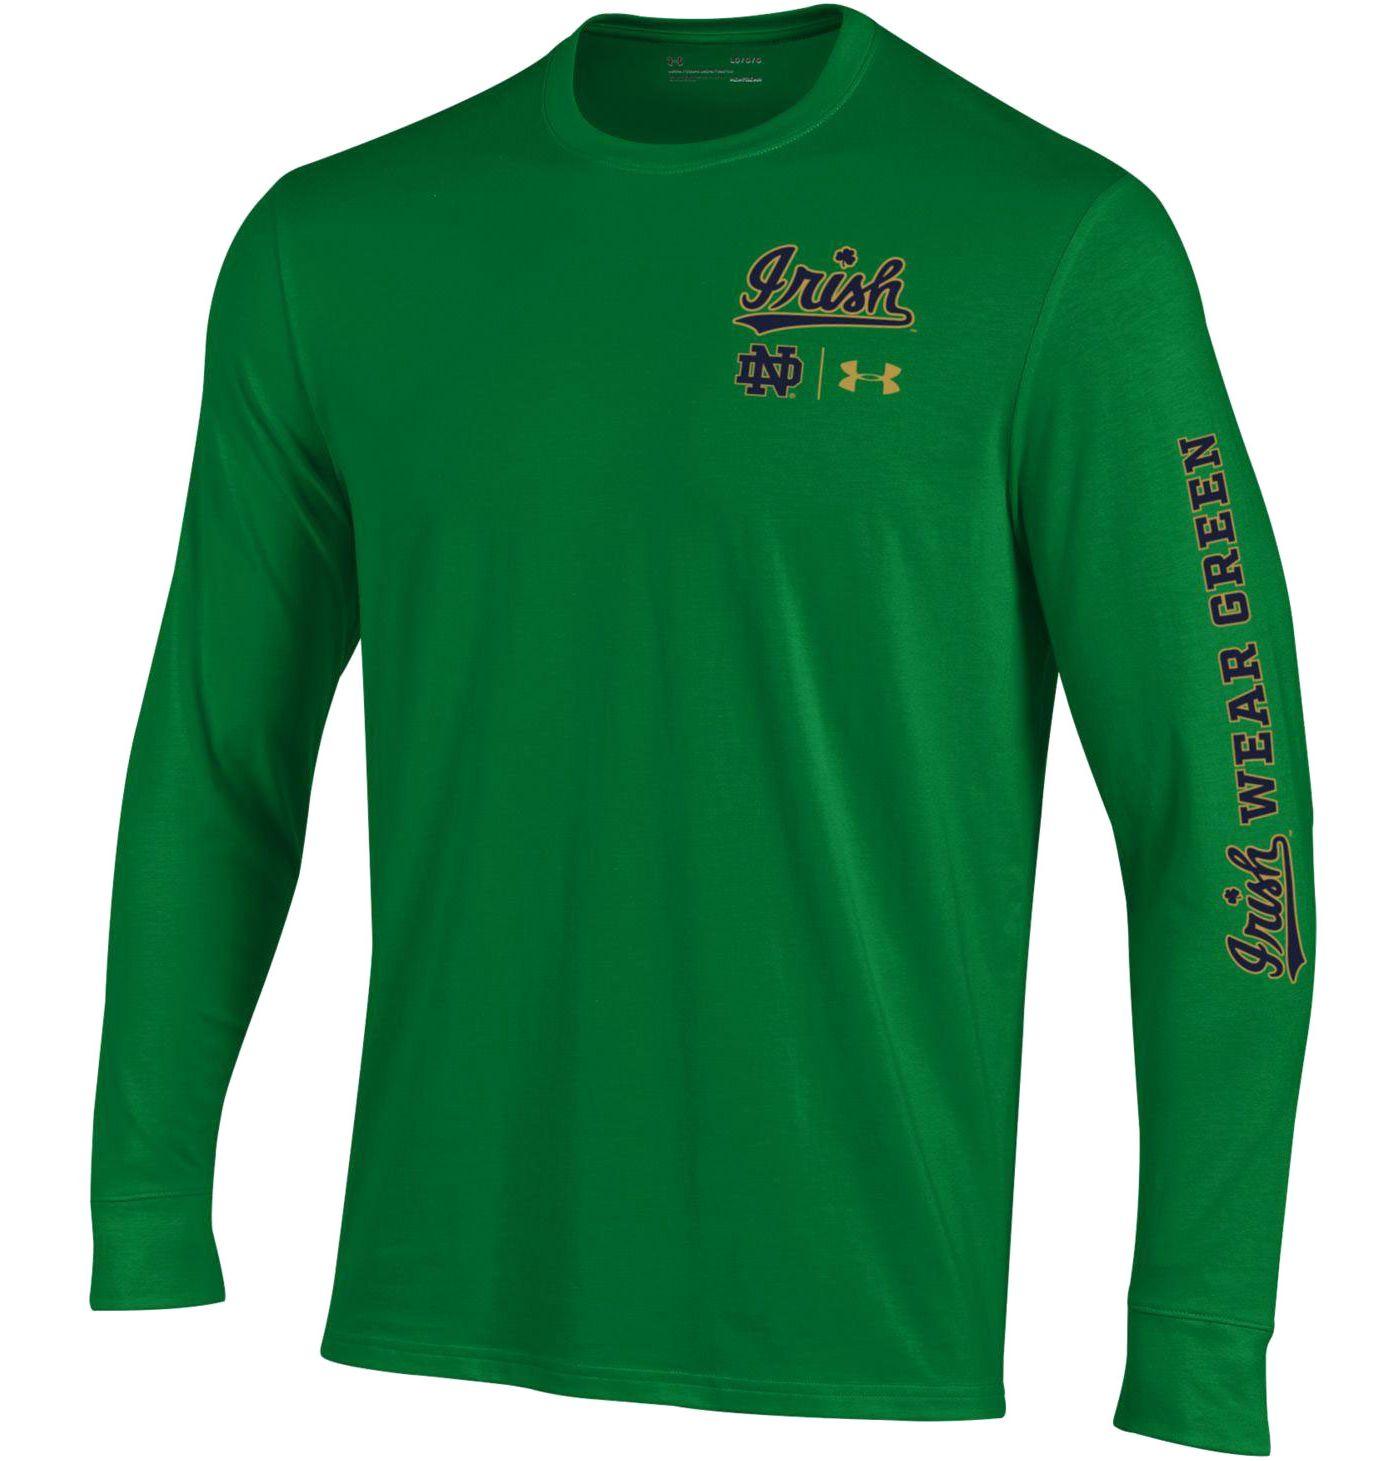 Under Armour Men's Notre Dame Fighting Irish 'Irish Wear Green' Performance Cotton Long Sleeve T-Shirt